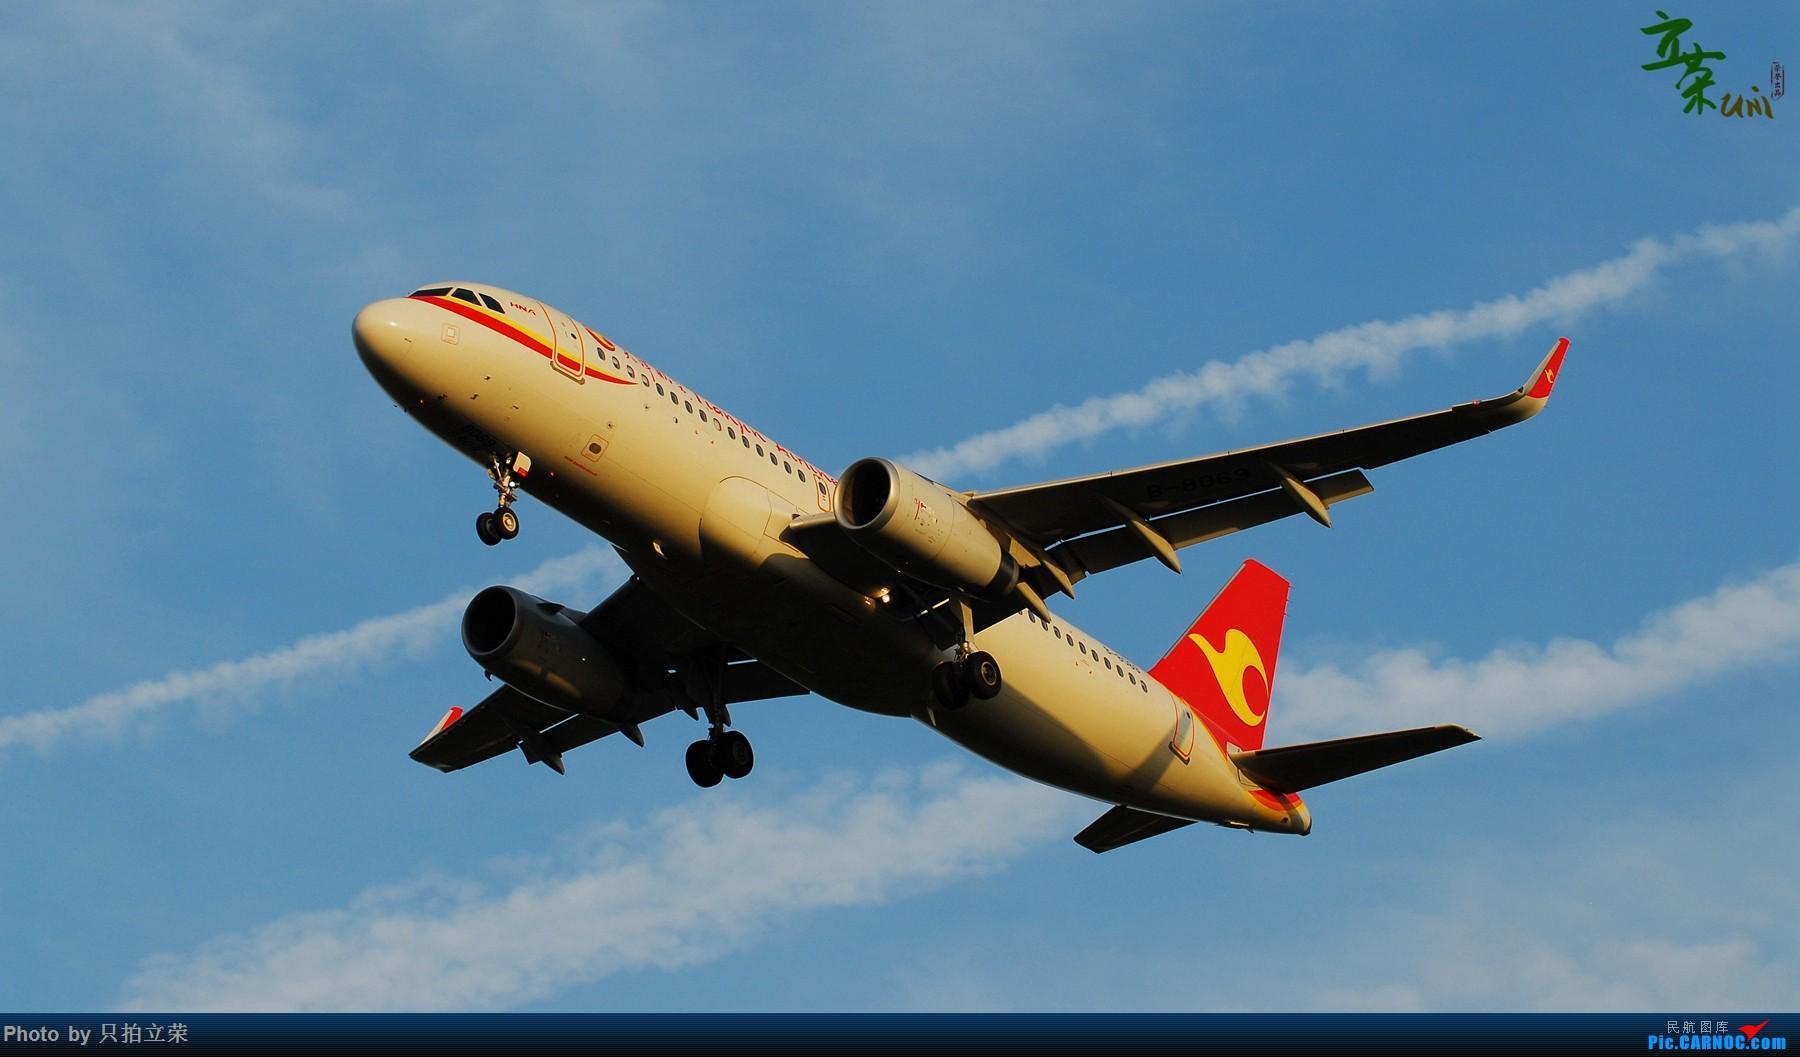 Re:[原创]长沙黄花的黄昏真的美 AIRBUS A320-200 B-8069 中国长沙黄花国际机场